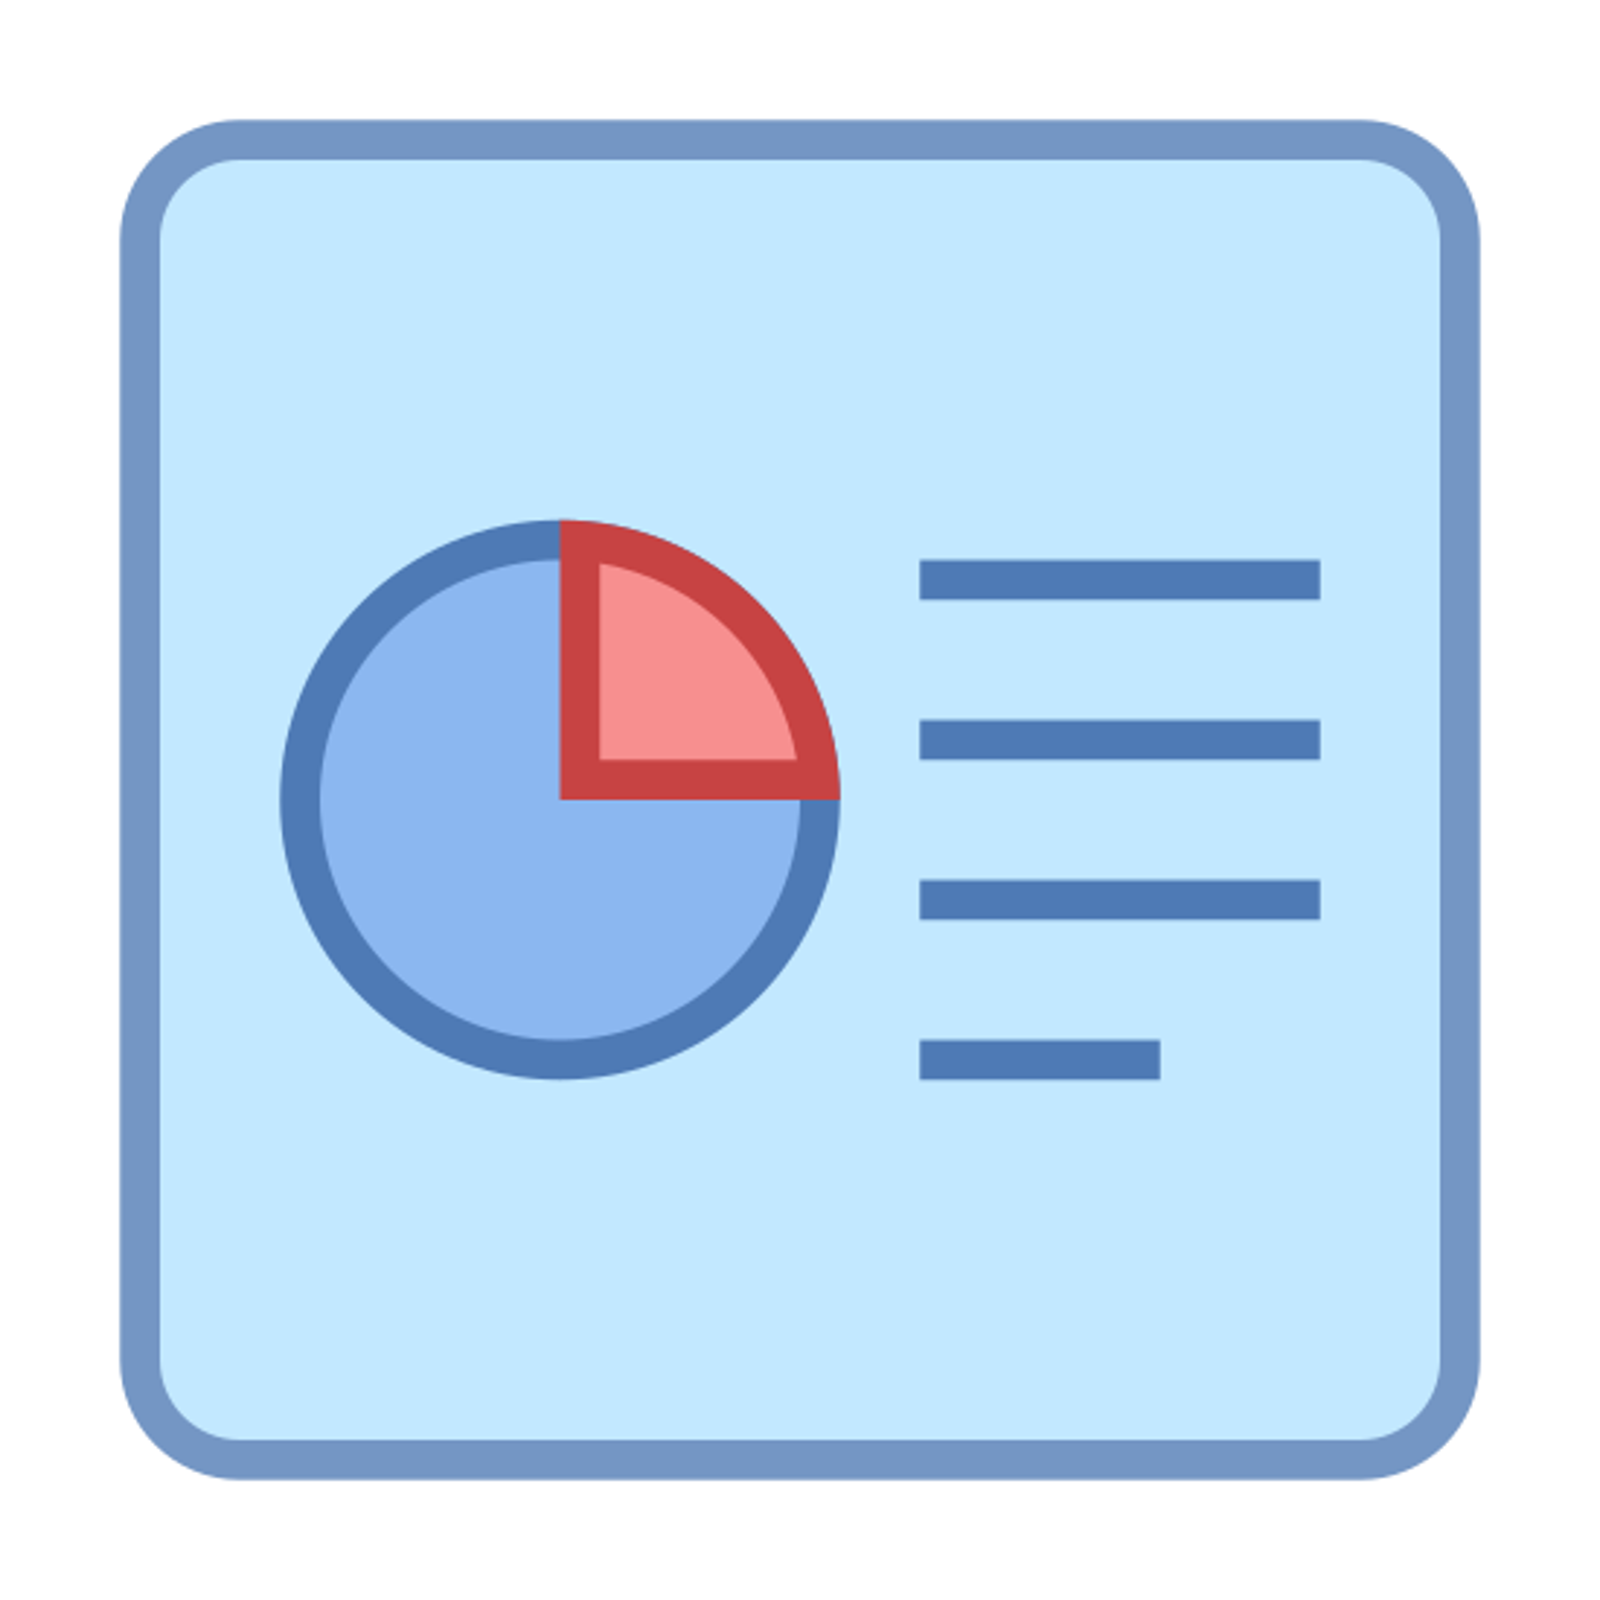 Google Presentation icon